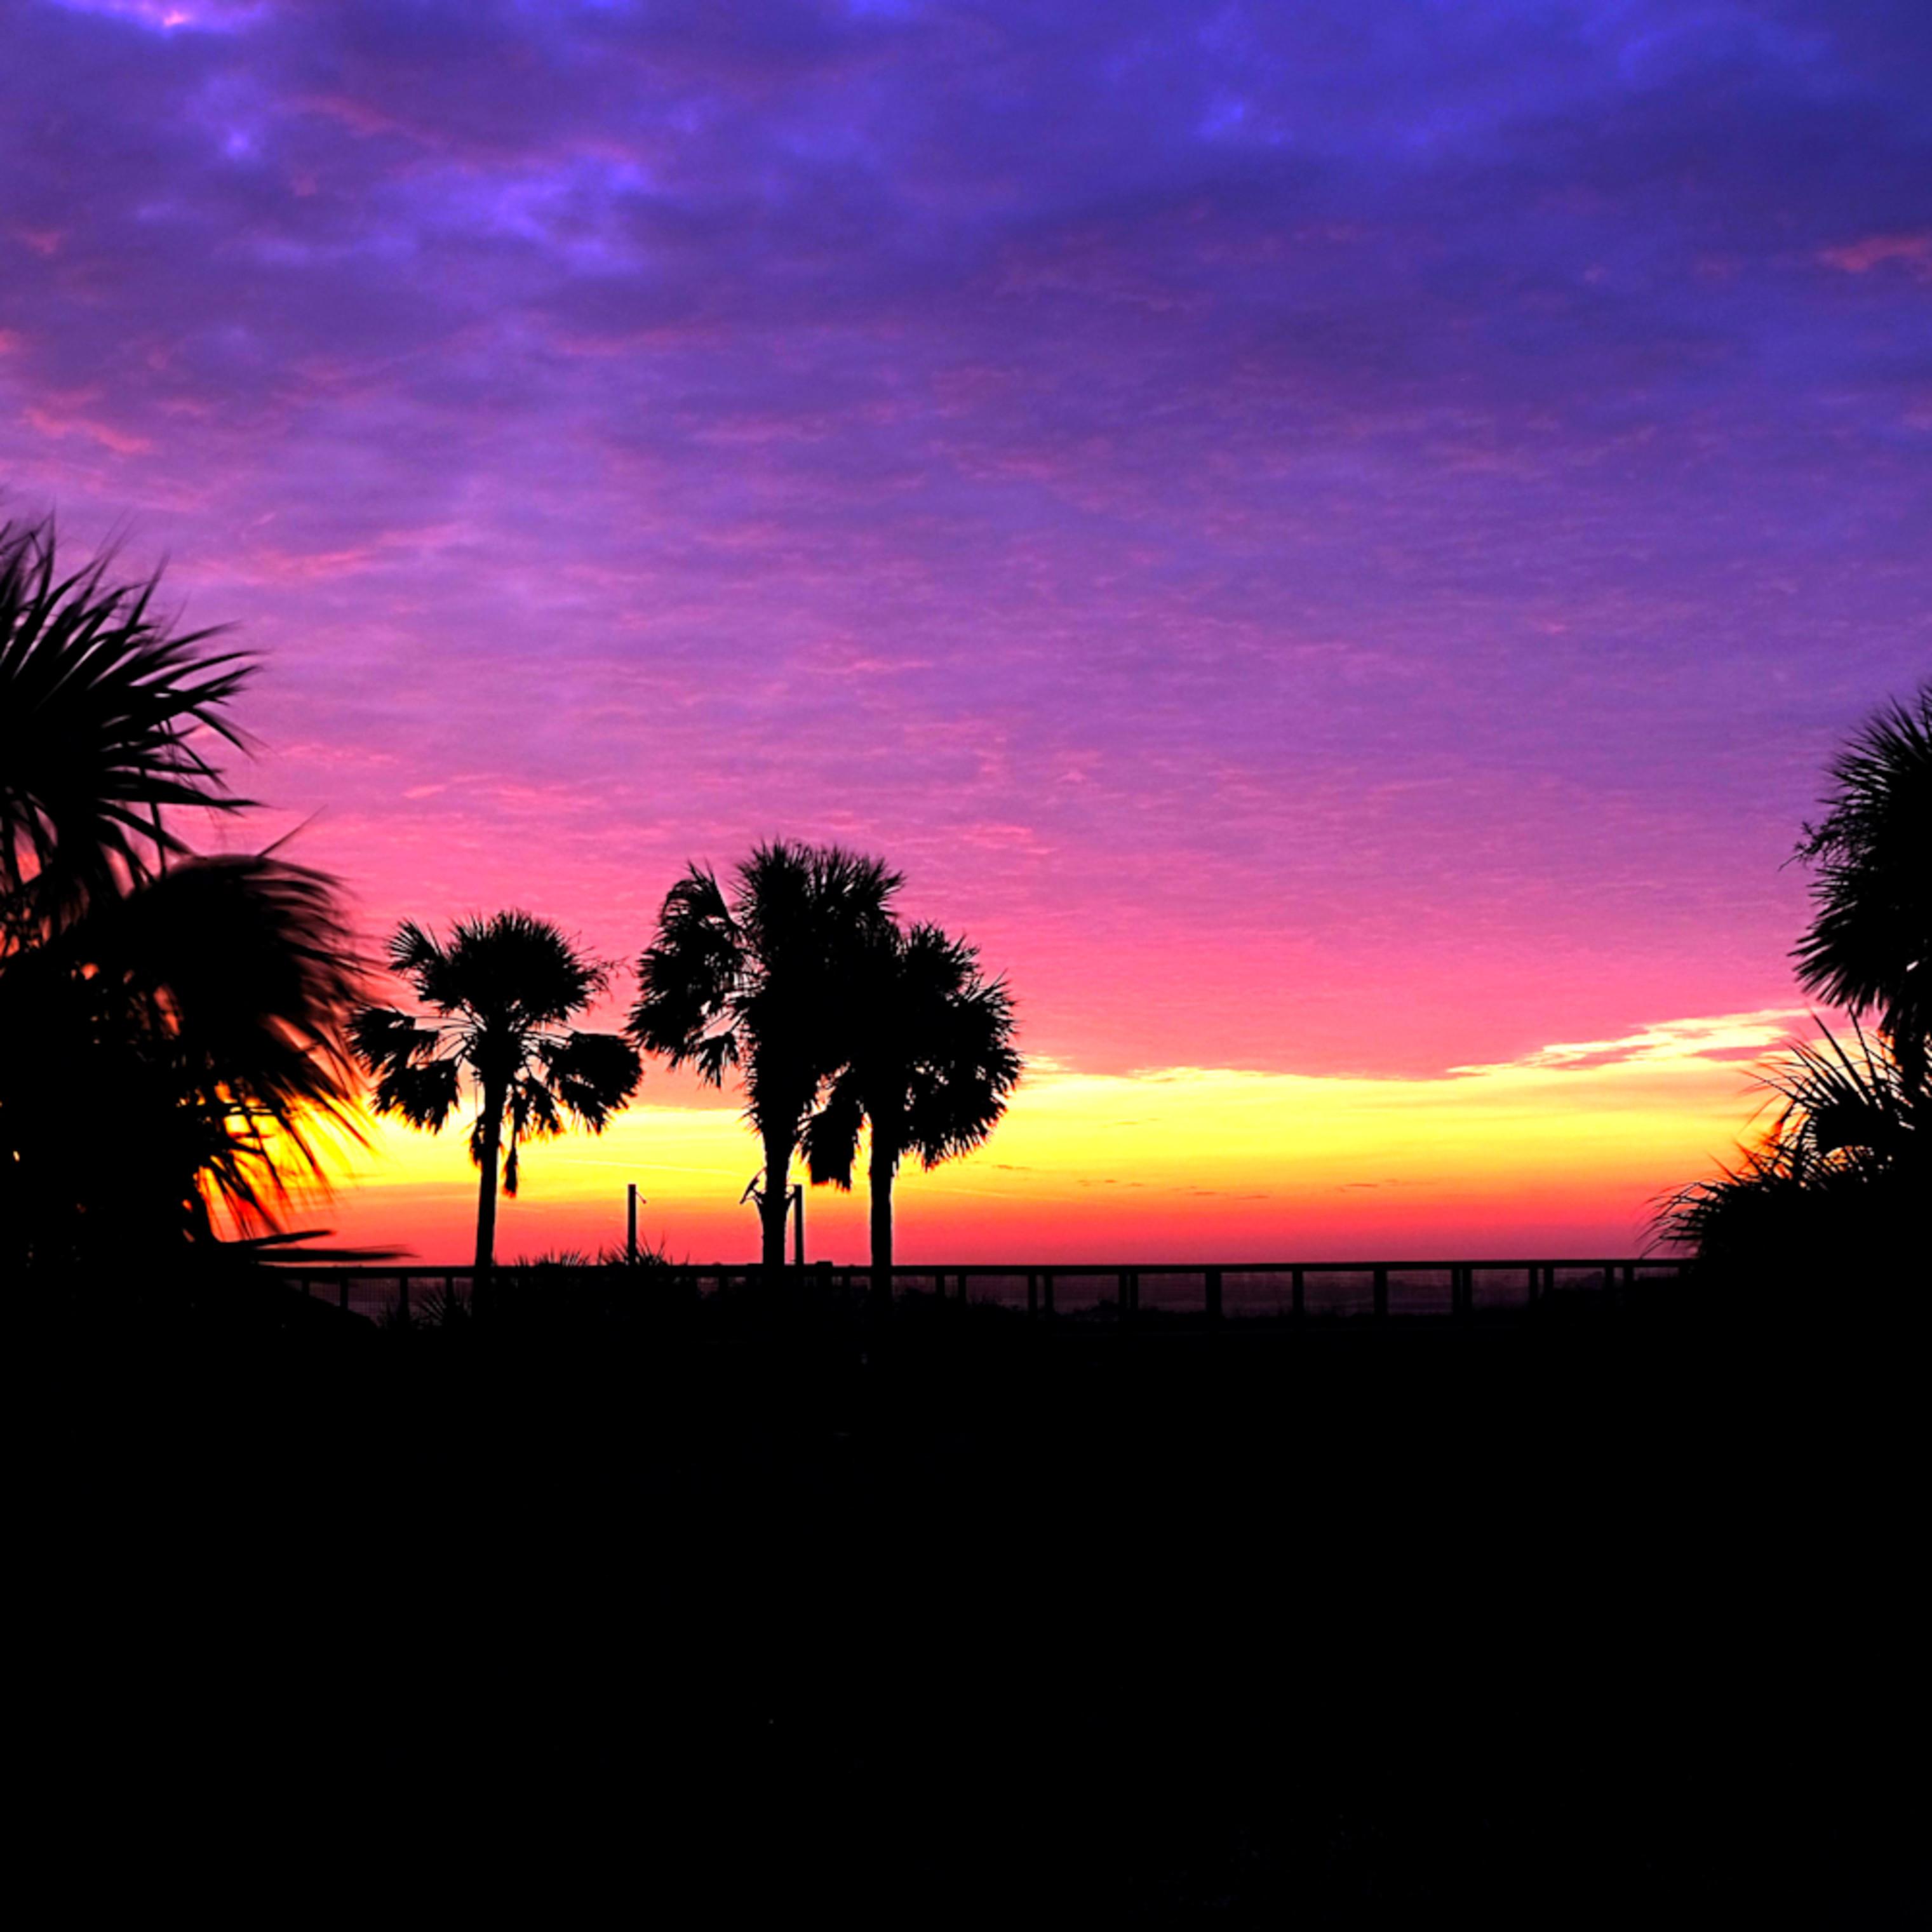 Emerald coast sunrise zez9xc